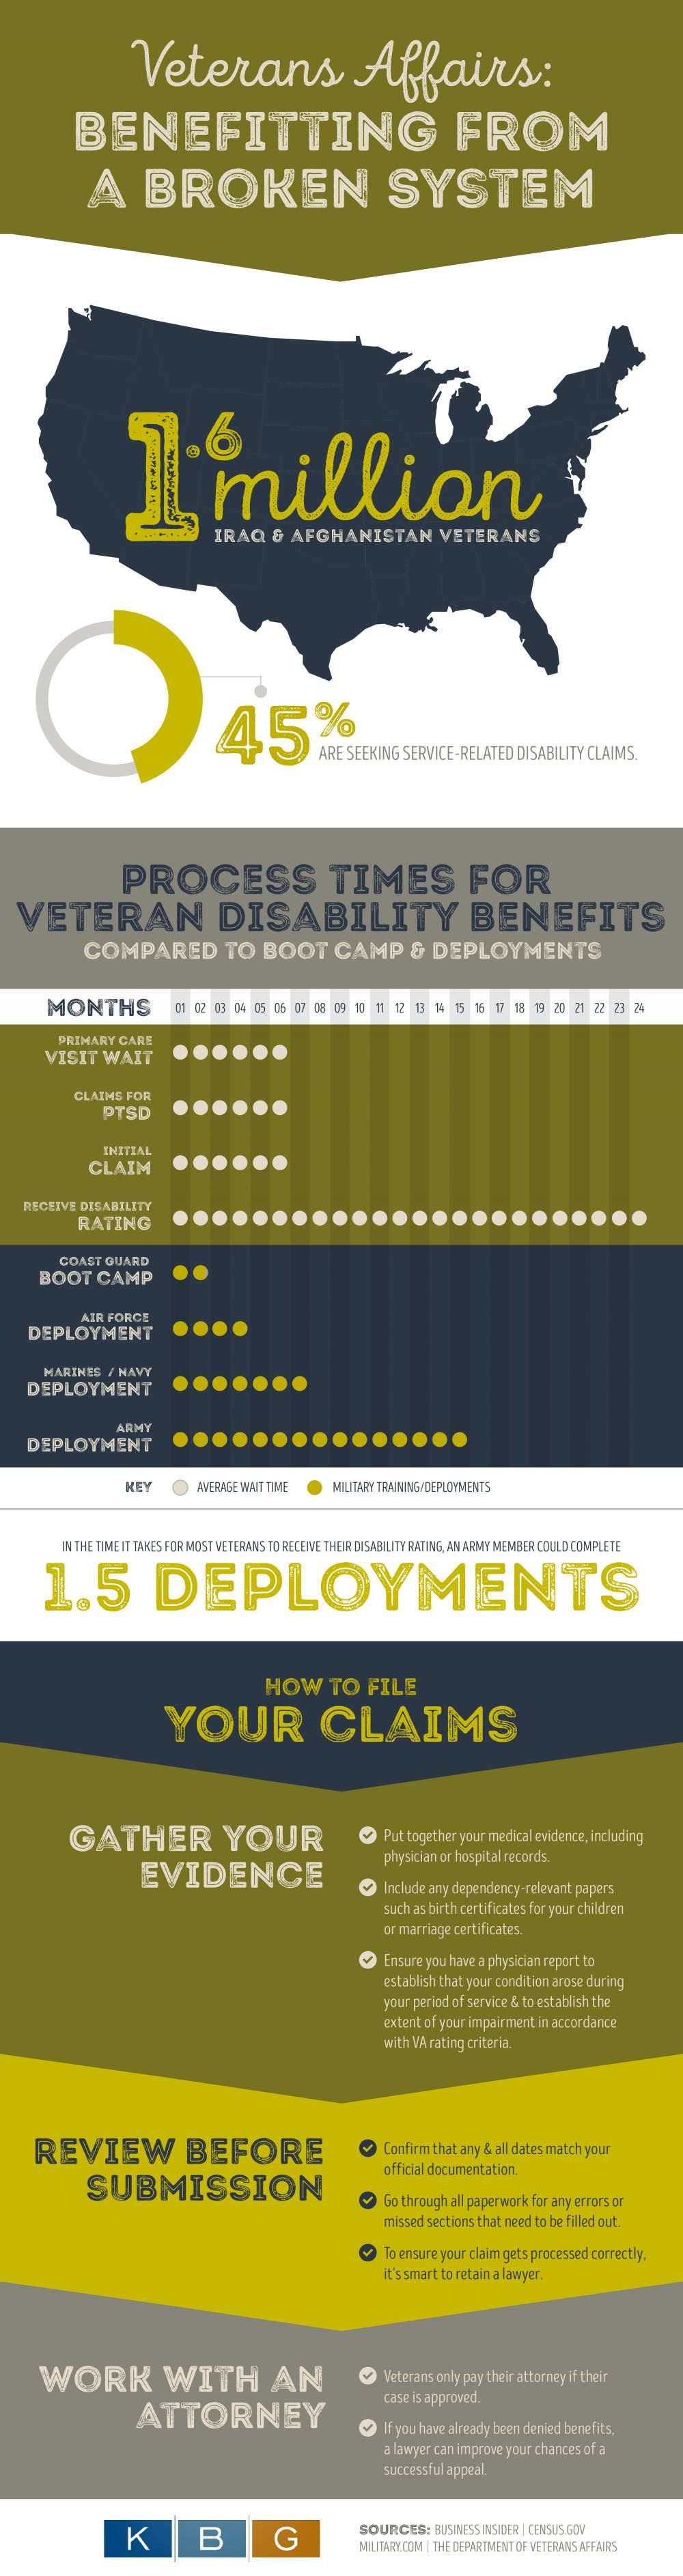 Veteran's Affairs